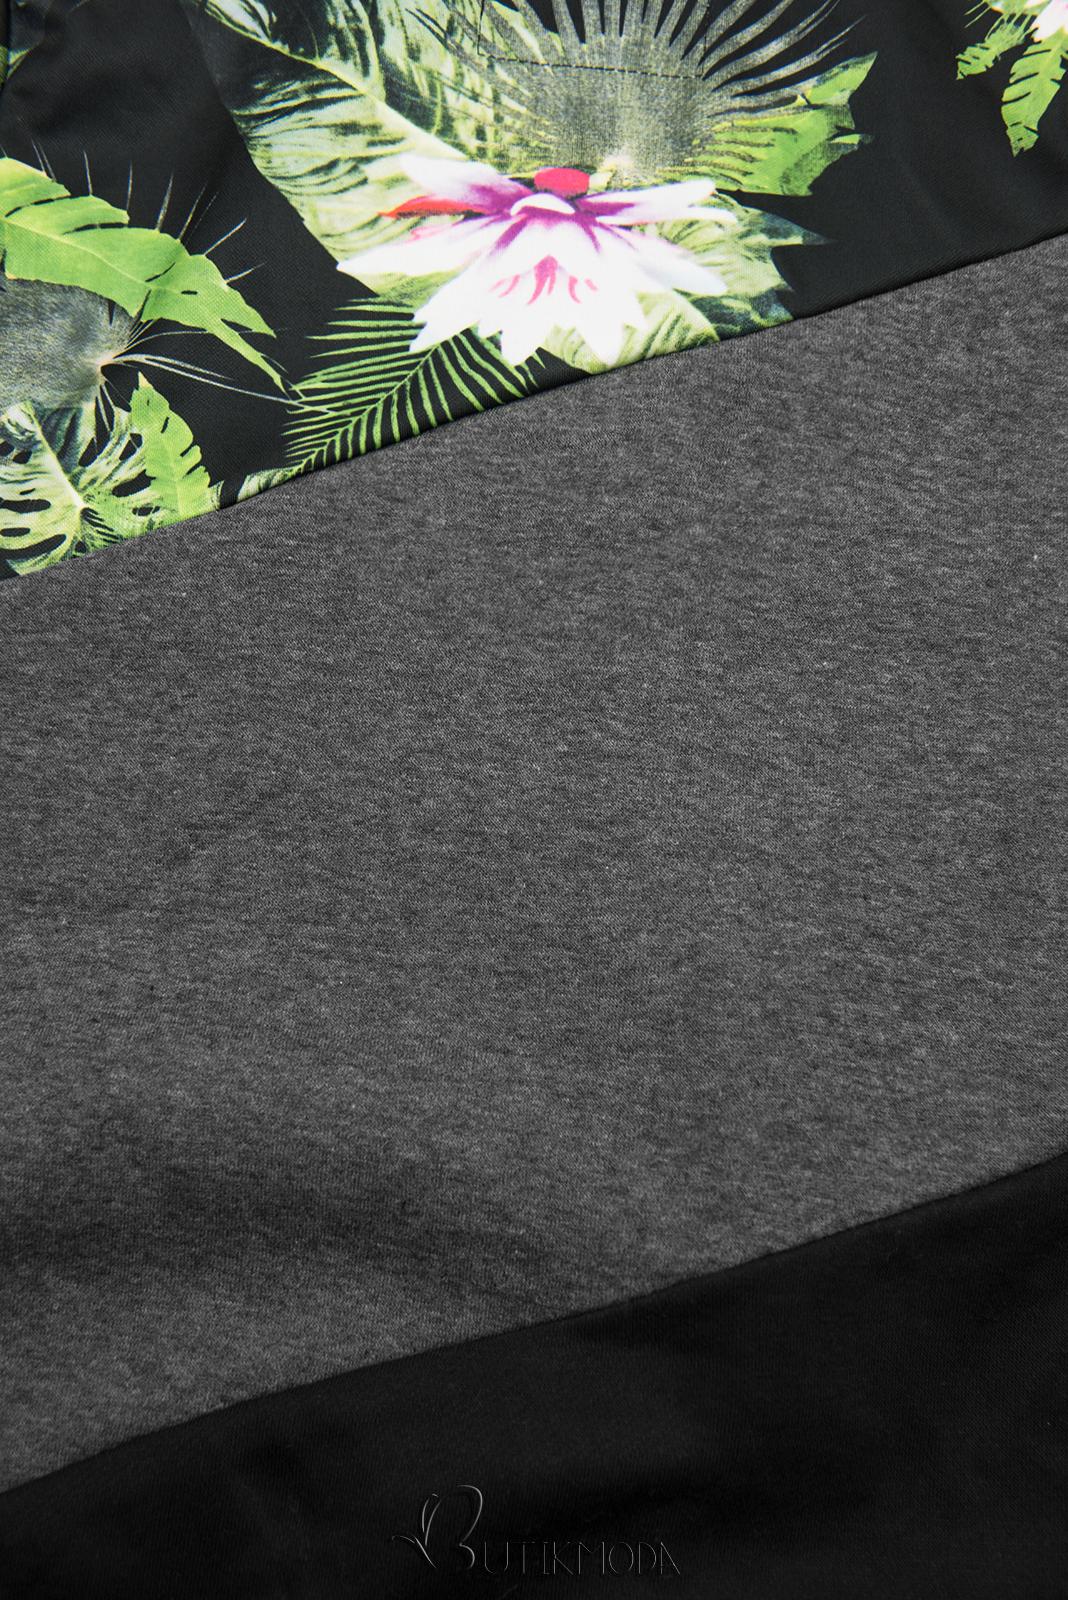 Hanorac floral antracit/negru